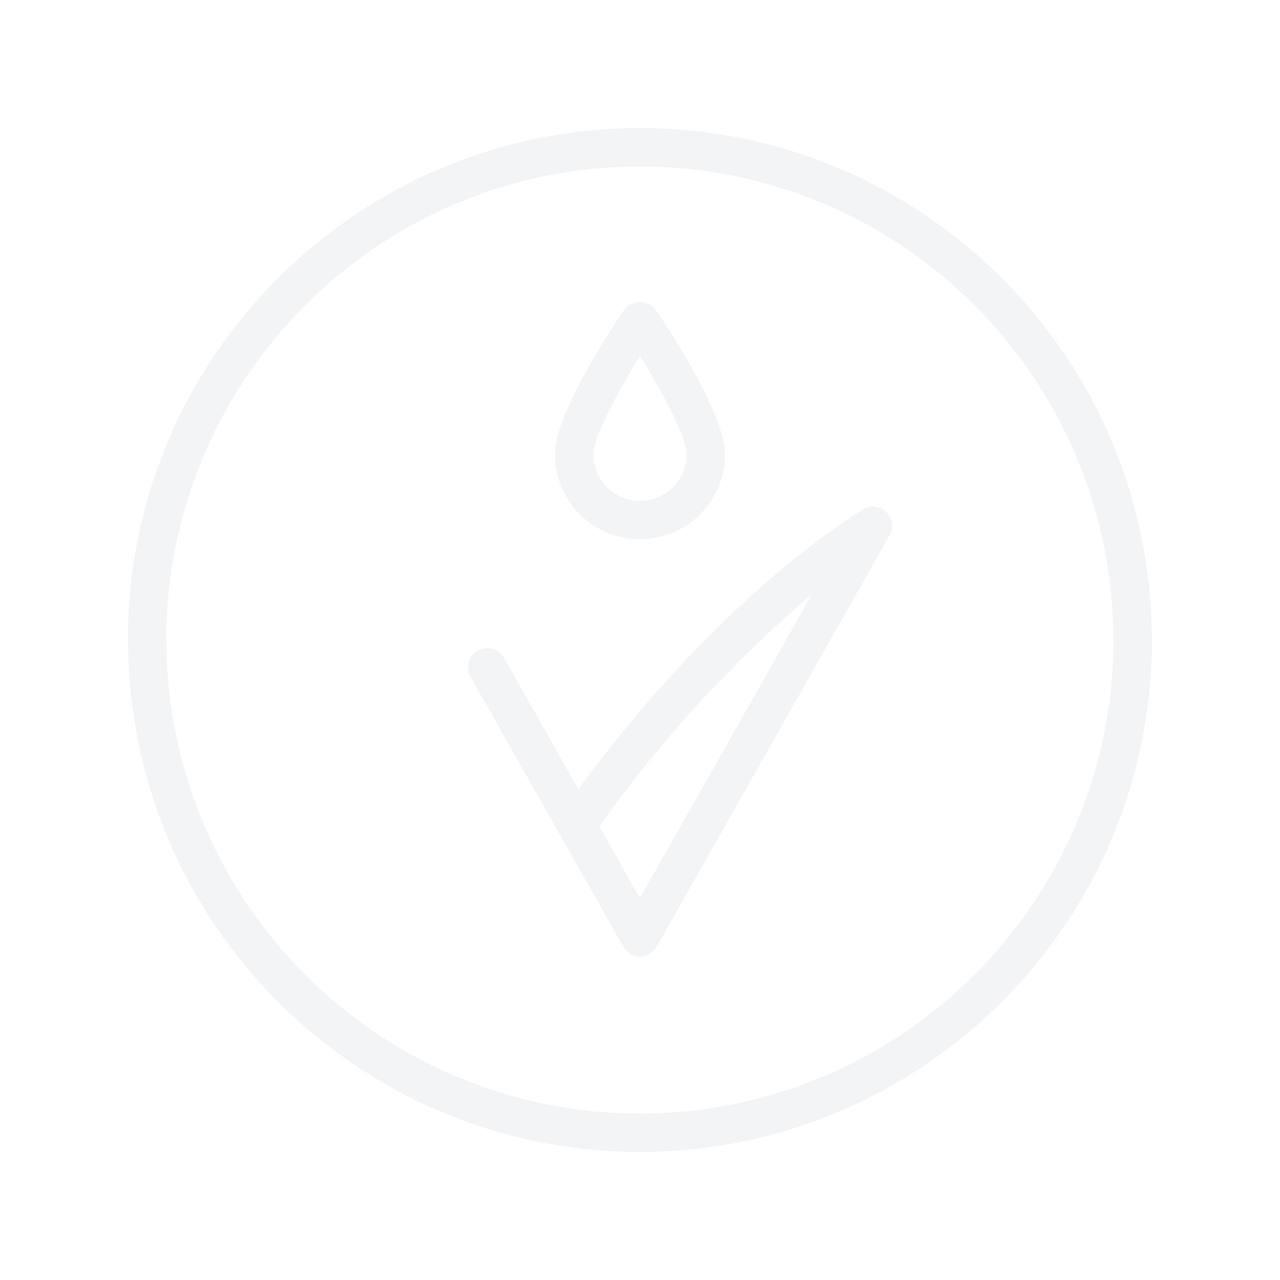 WELLA PROFESSIONALS Oil Reflections Luminous Reboost Mask 150ml